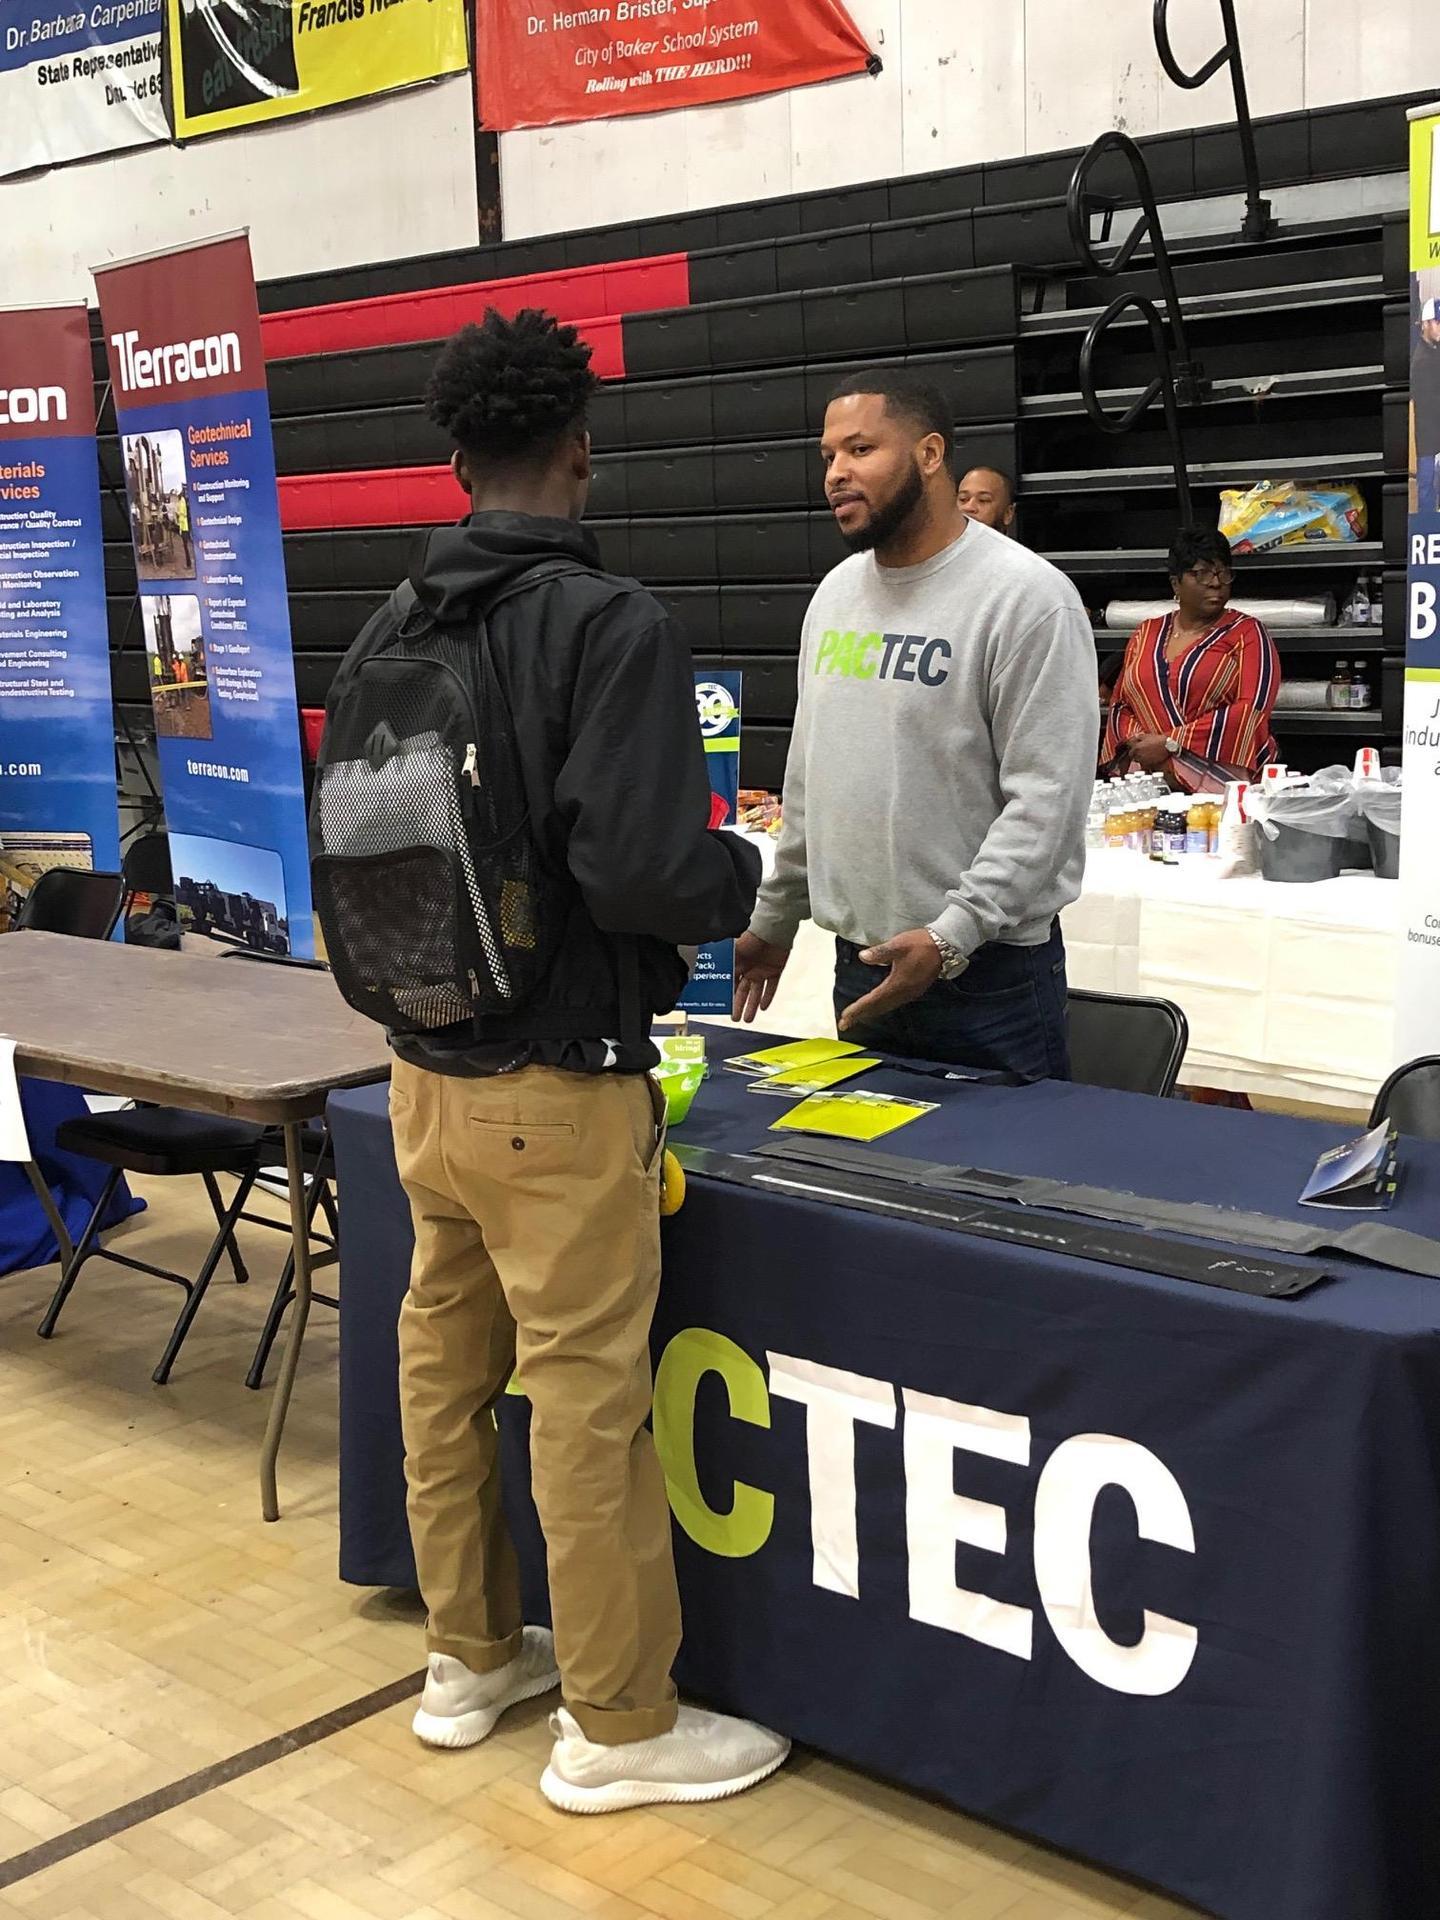 A photo from the 2019 Baker High School College & Career Fair